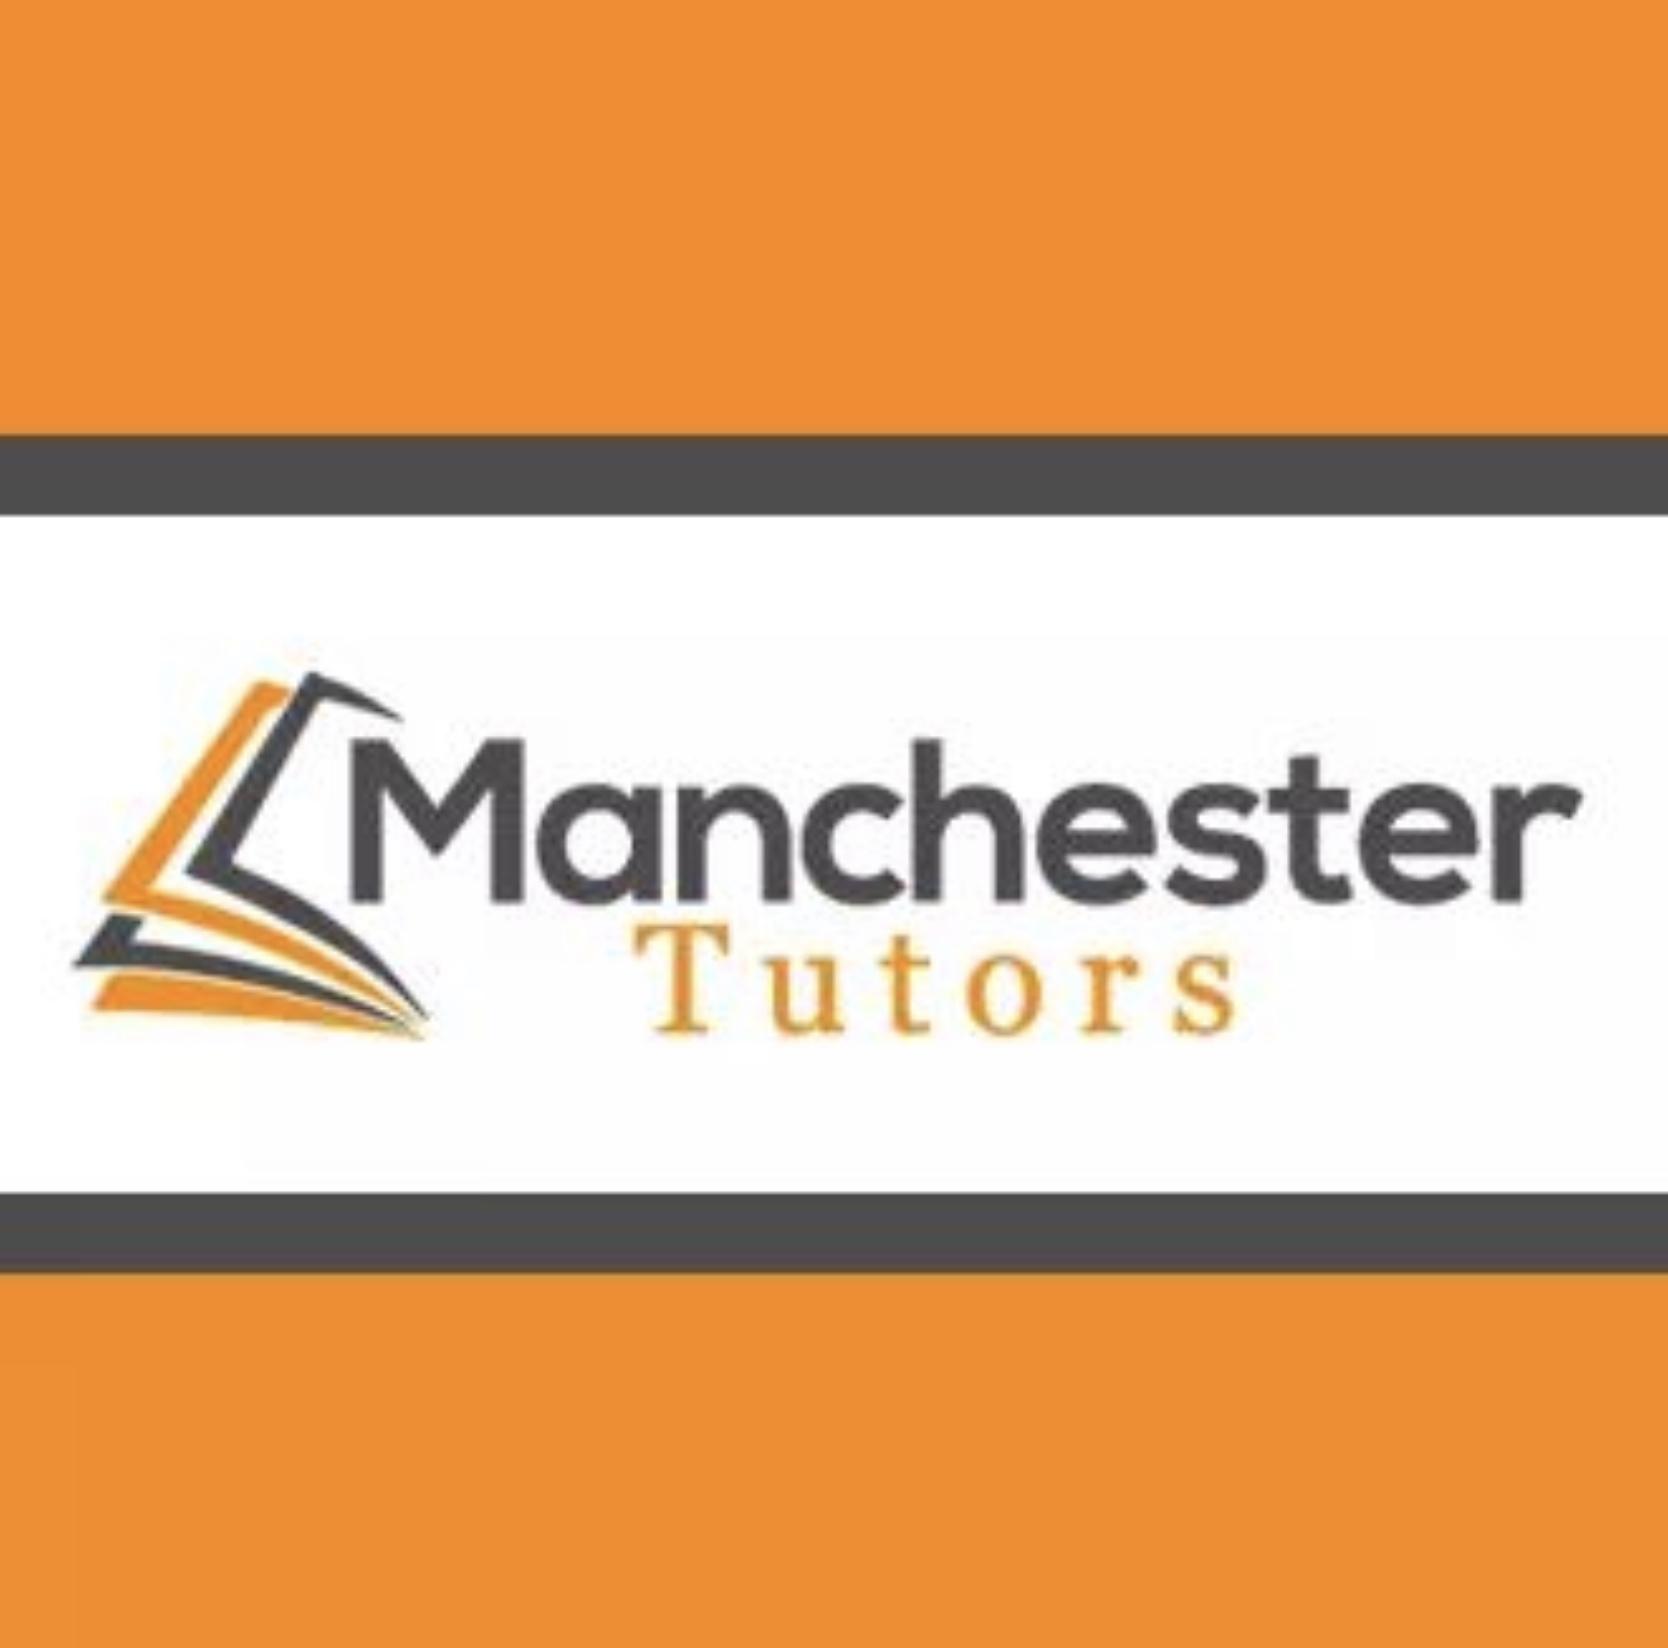 Manchester Tutors